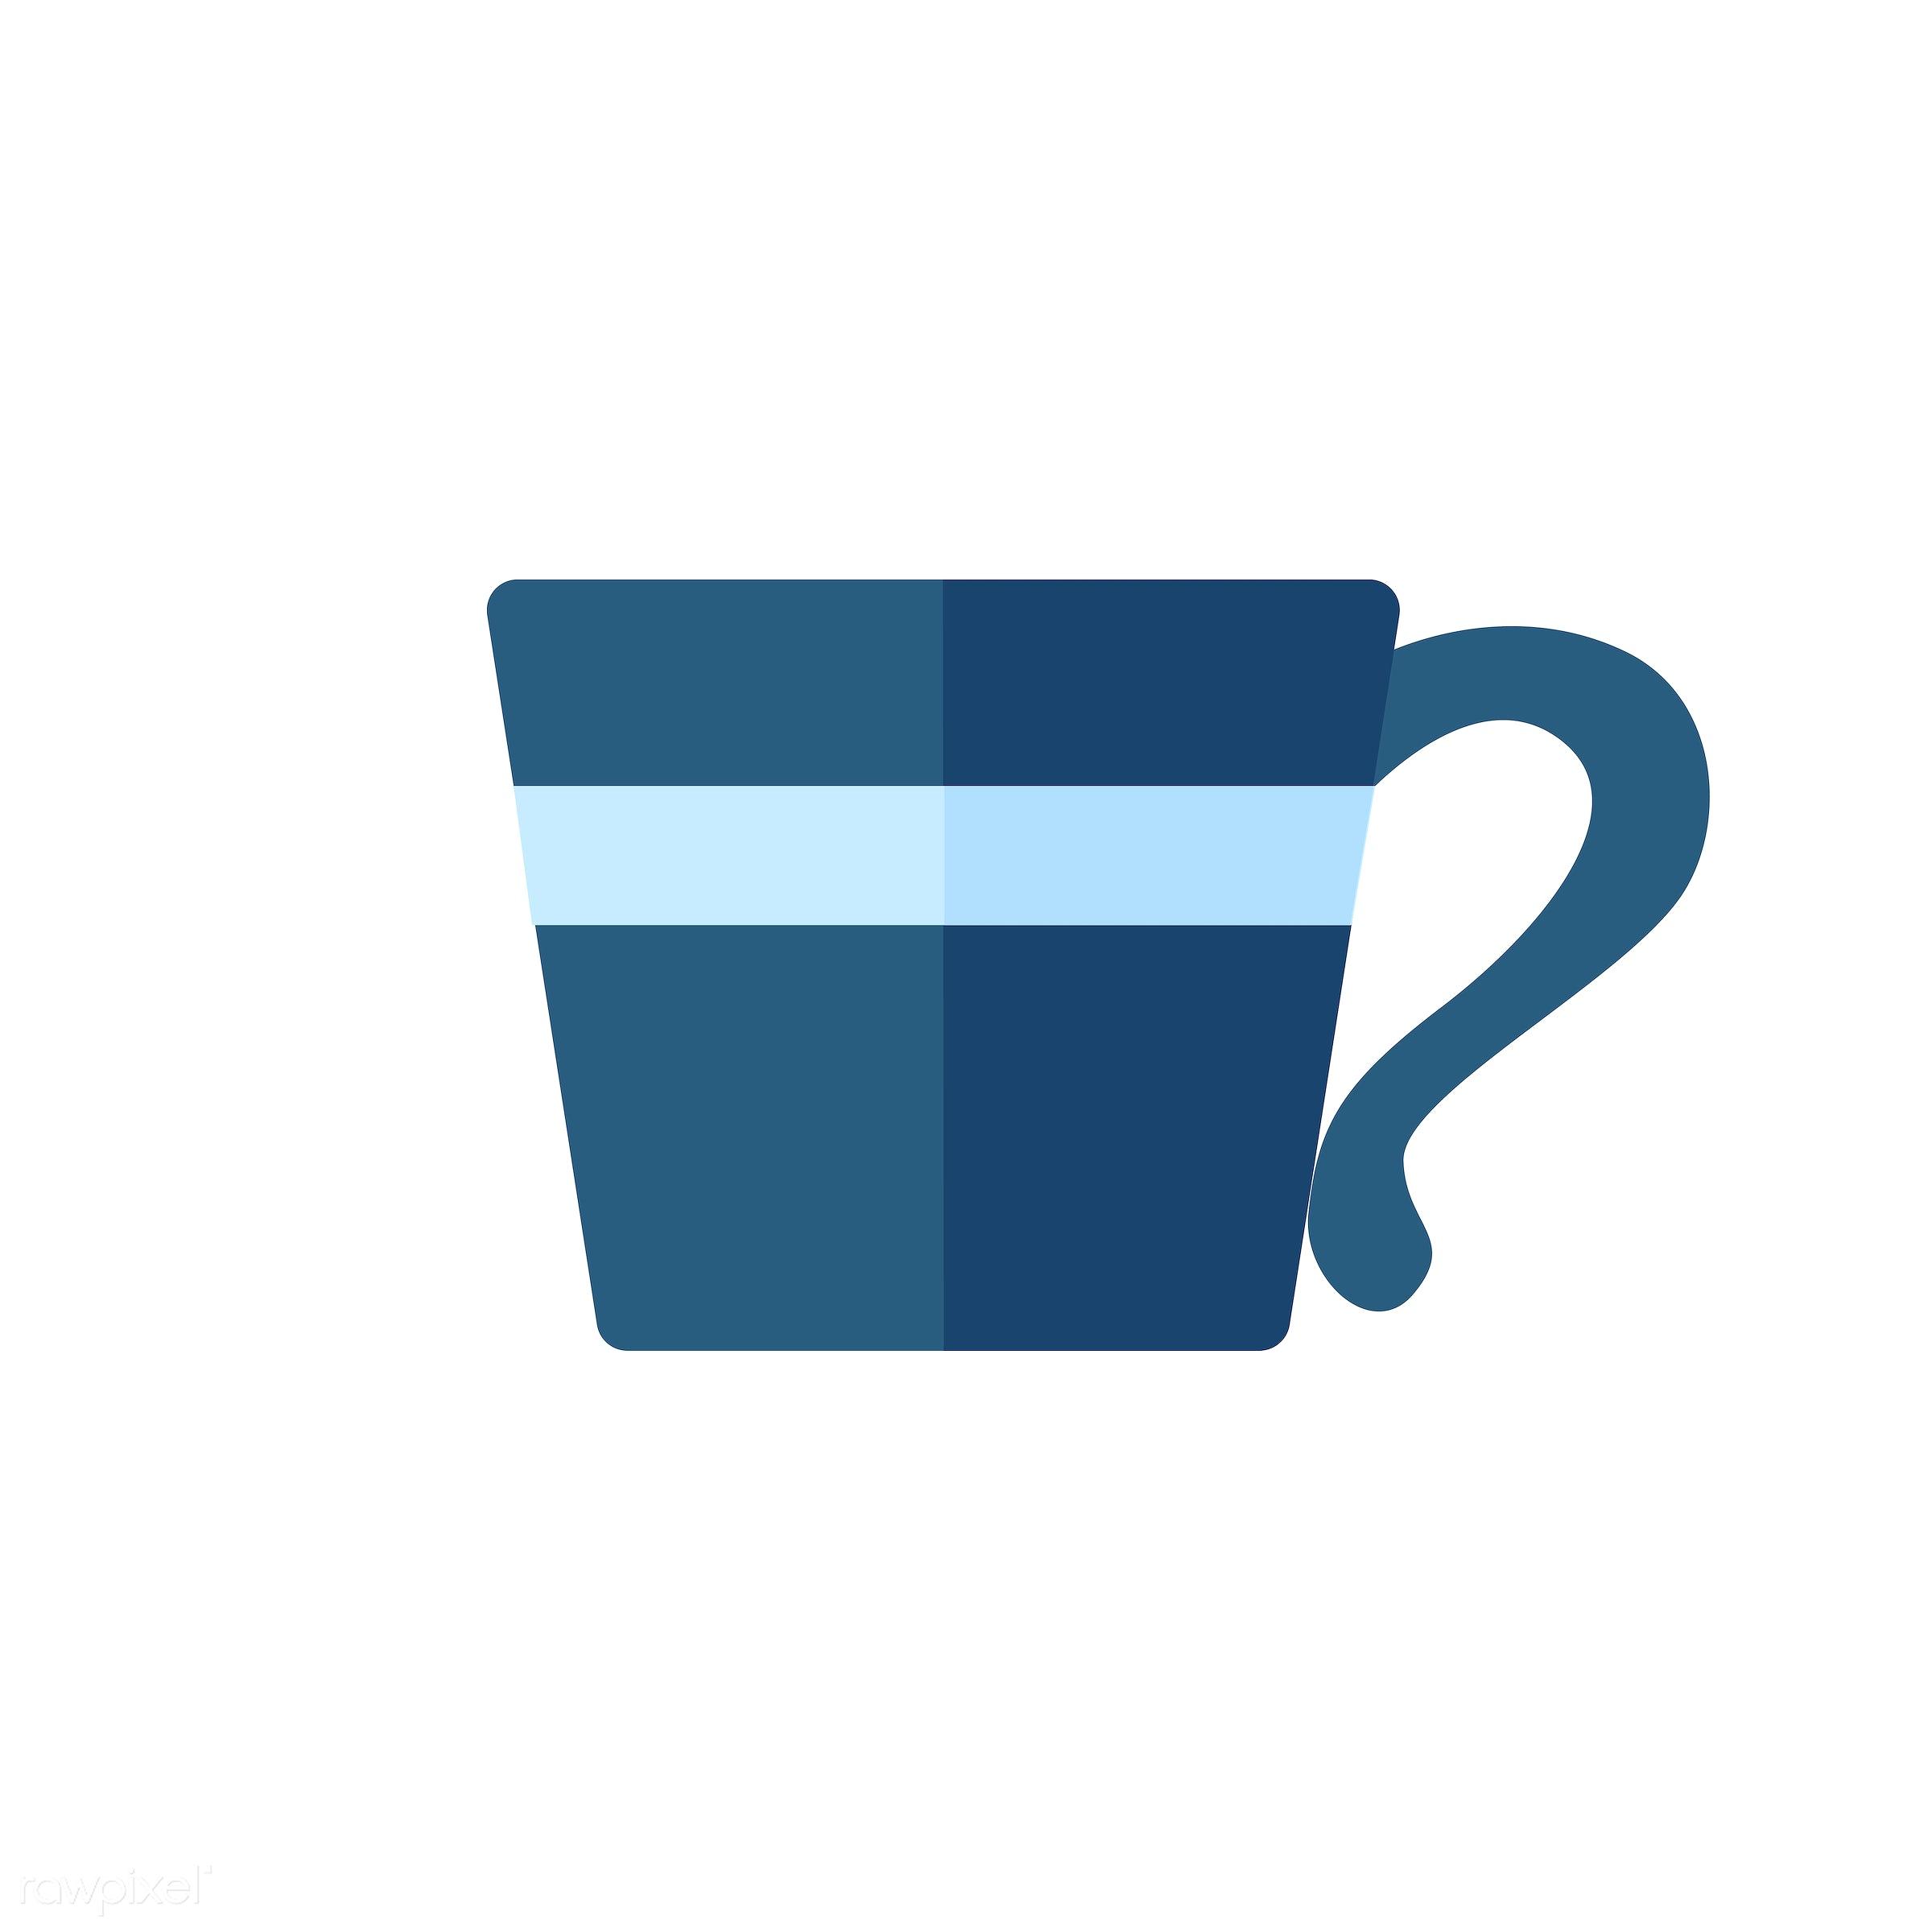 vector, graphic, illustration, icon, symbol, colorful, cute, mug, tea, tea cup, hot drink, drink, beverage, water, blue,...